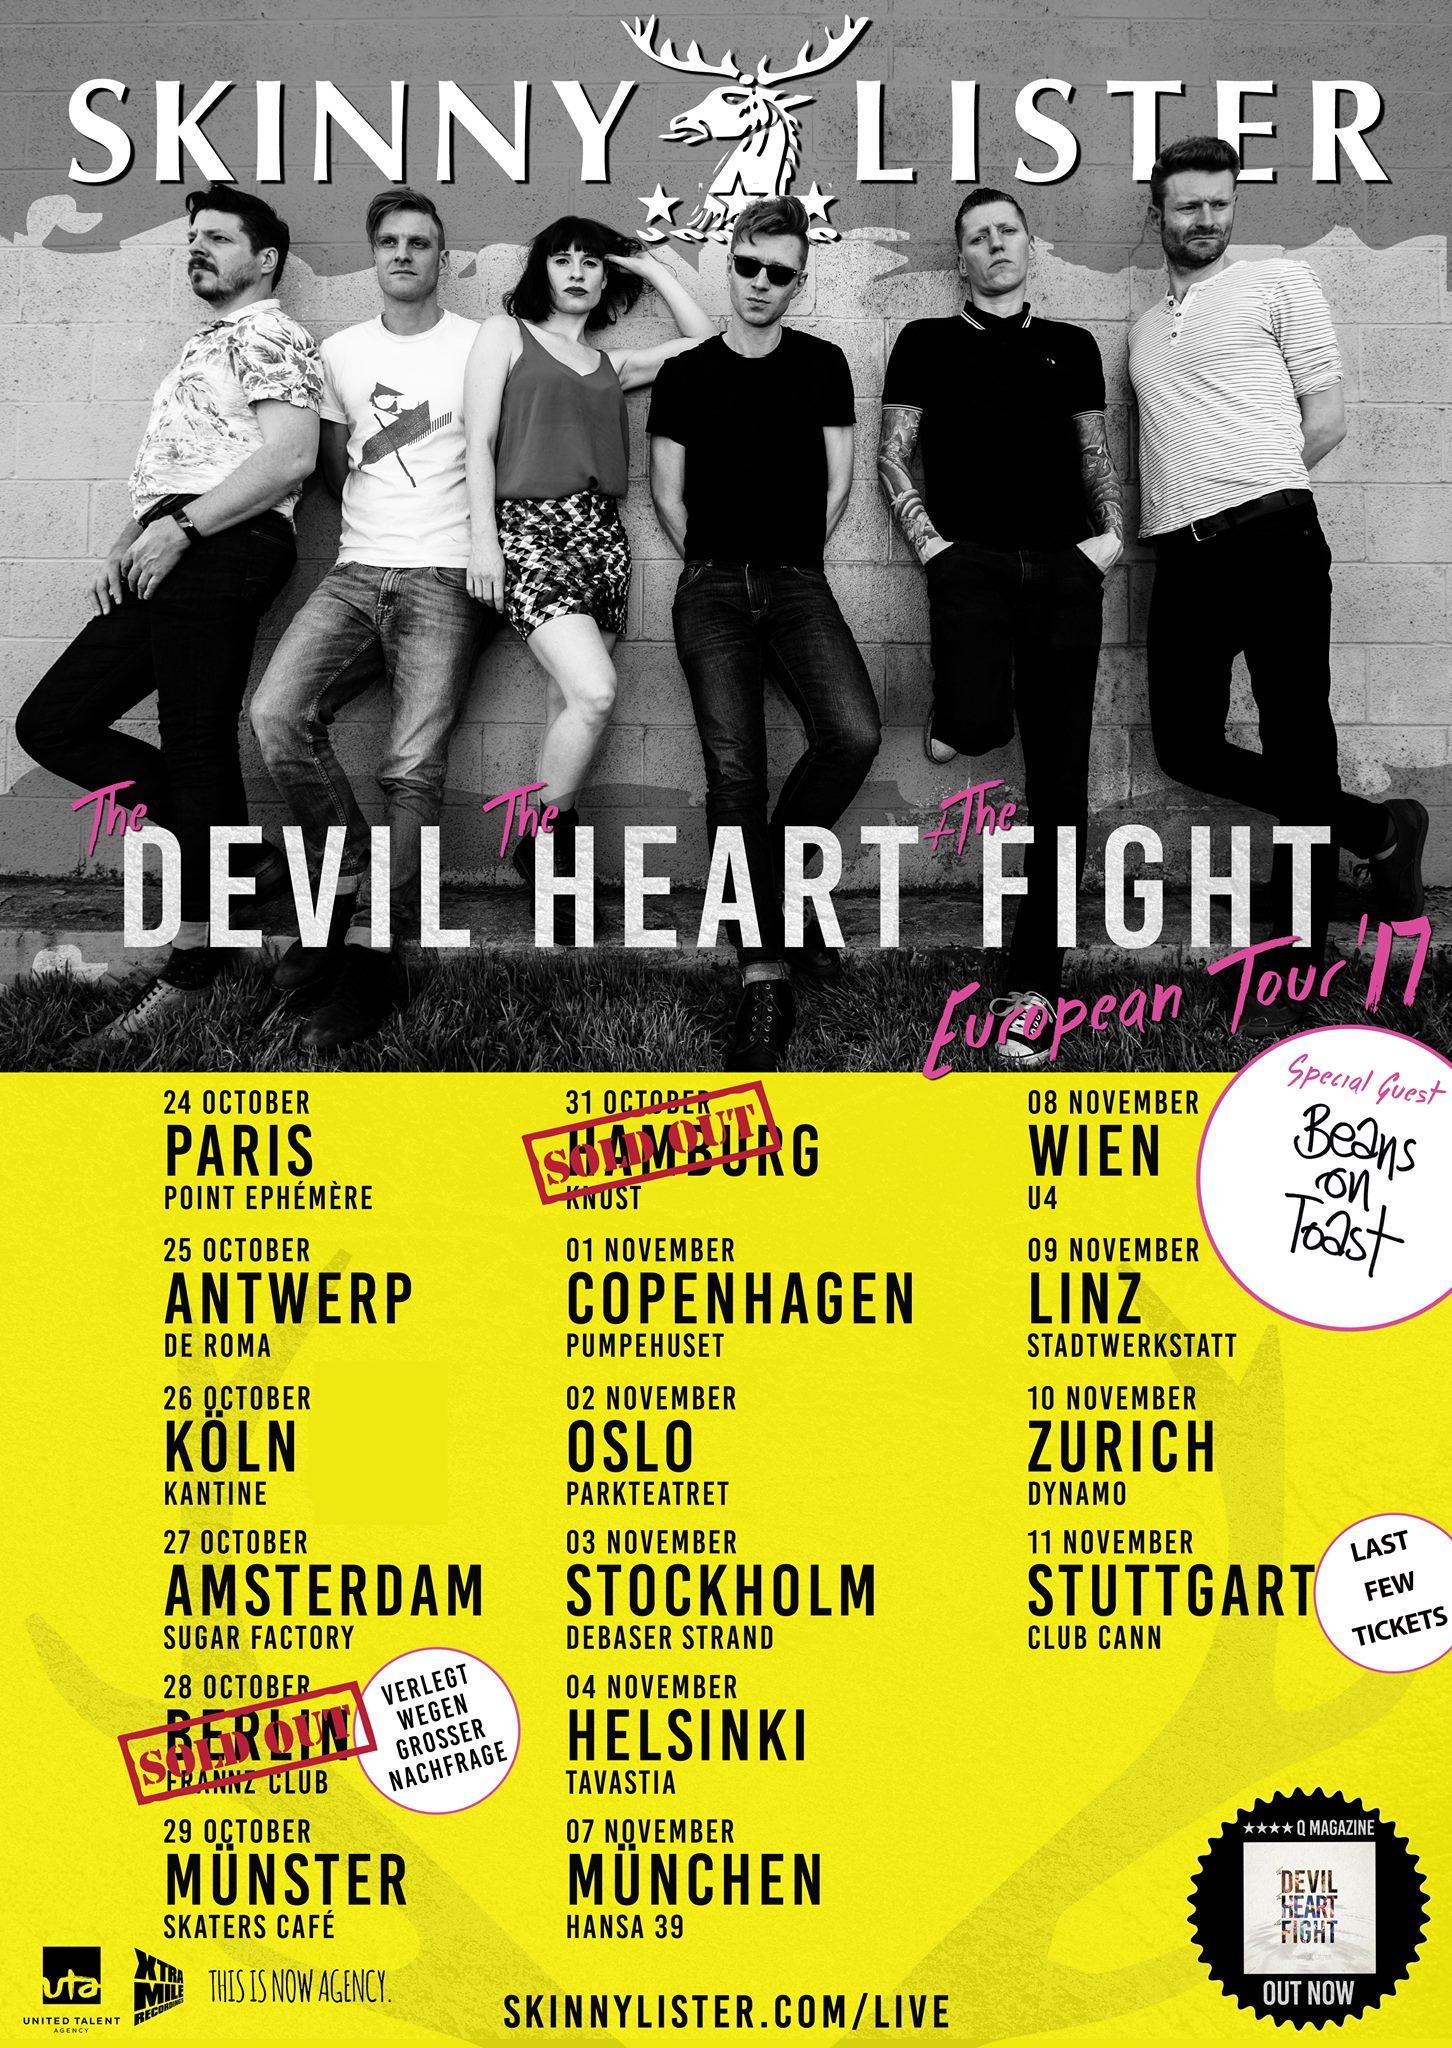 Skinny EU tour admat 2017 w sold outs (1).jpg